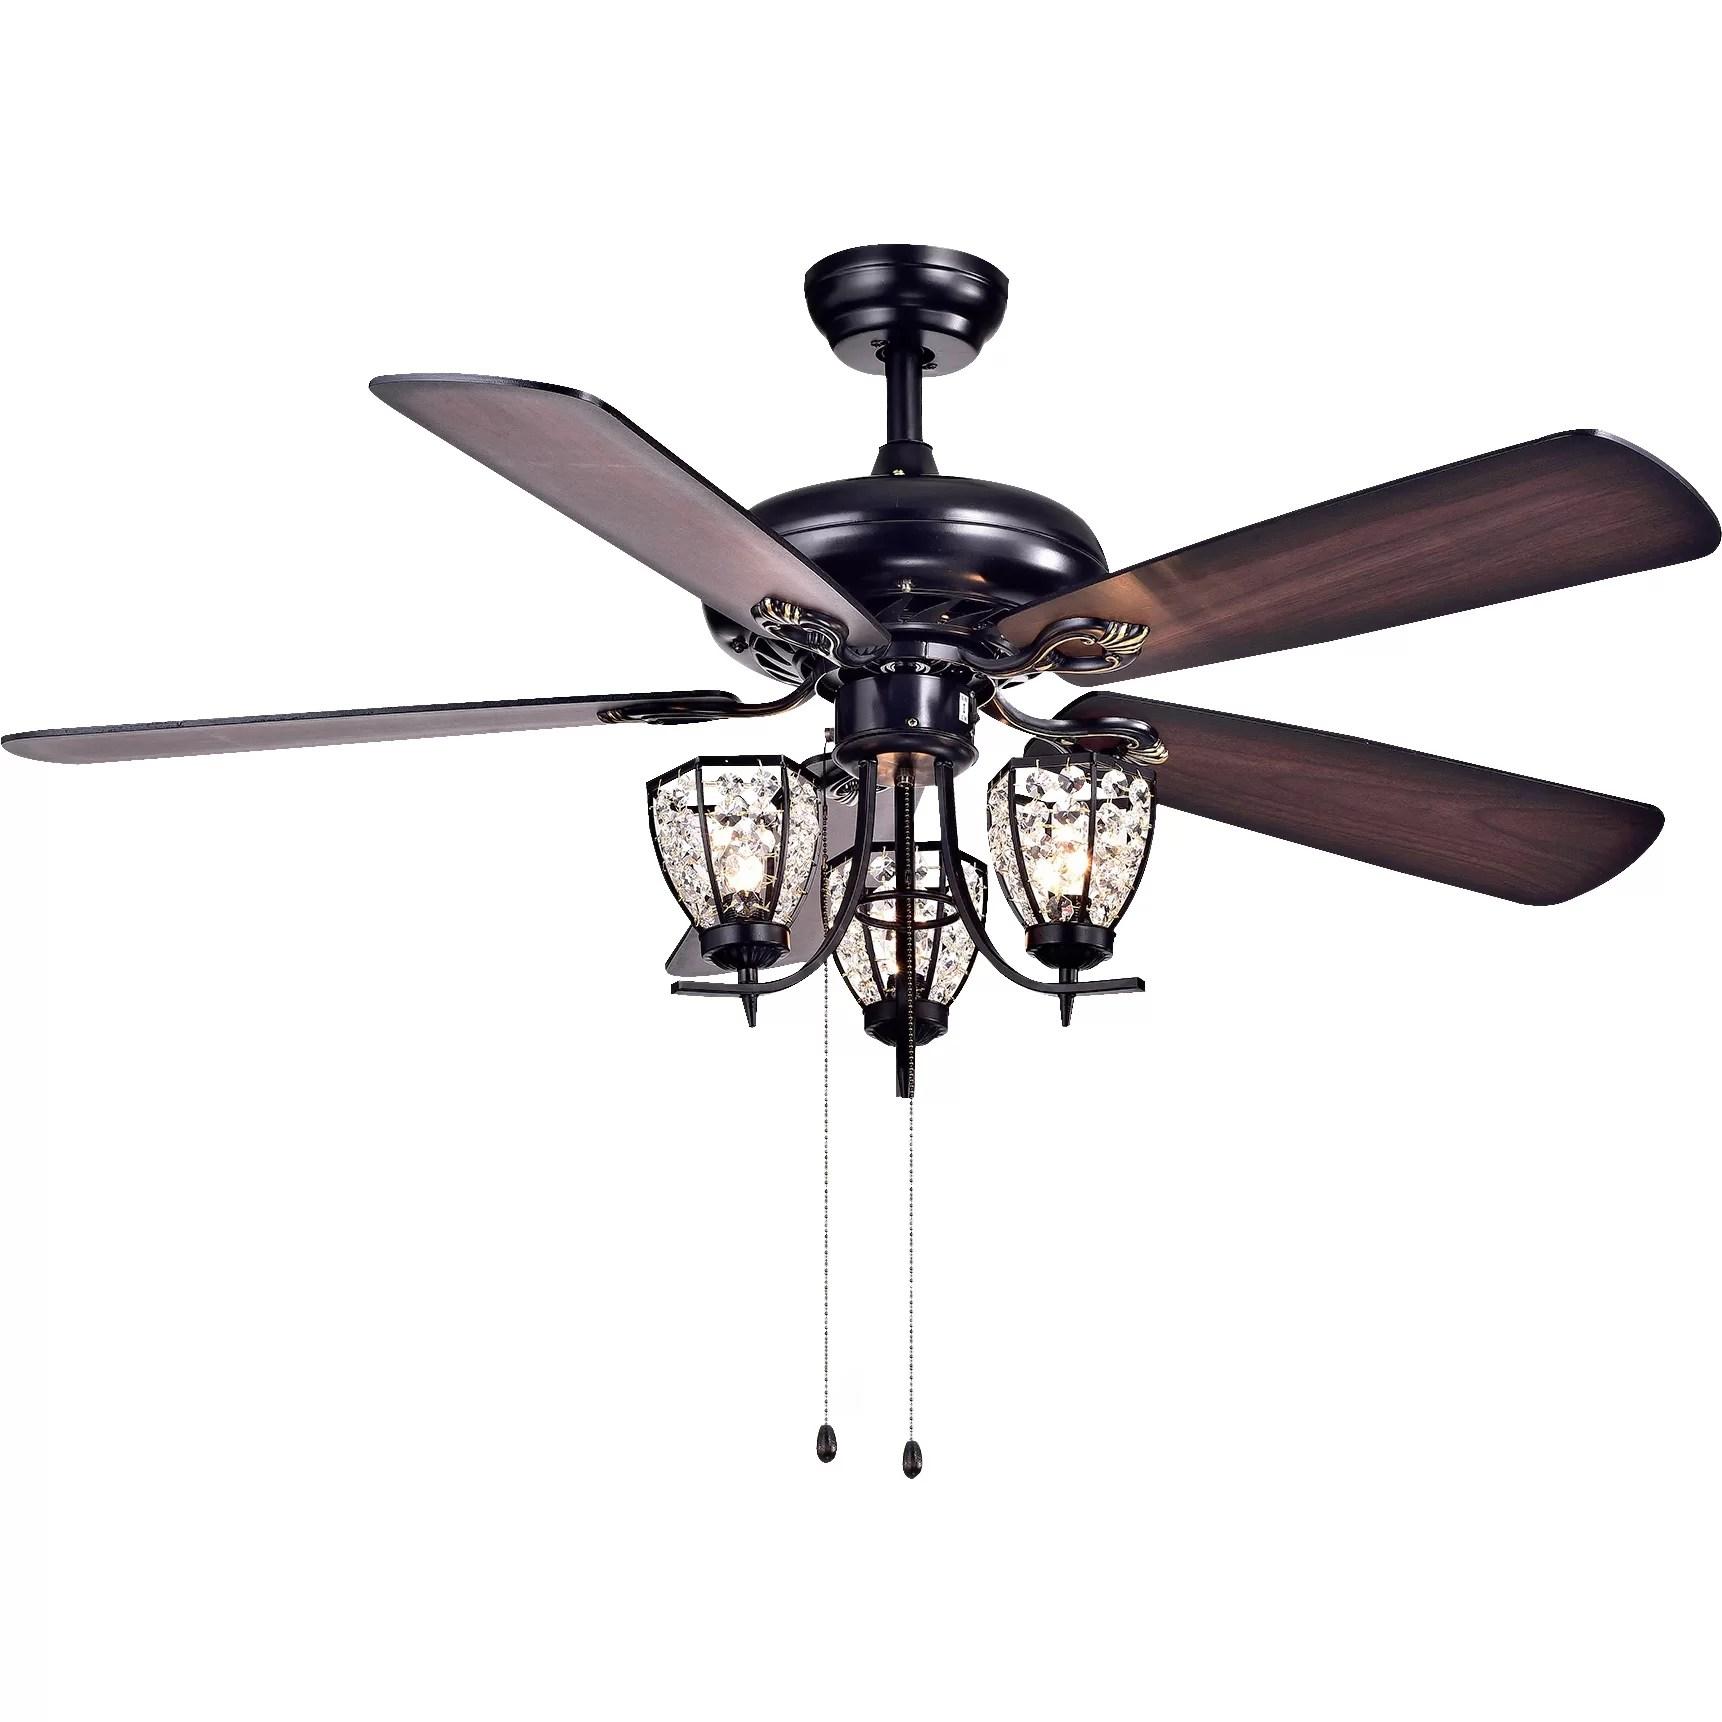 ceiling fan light kits bmw e46 amplifier wiring diagram warehouse of tiffany mirabelle 3 under cabinet